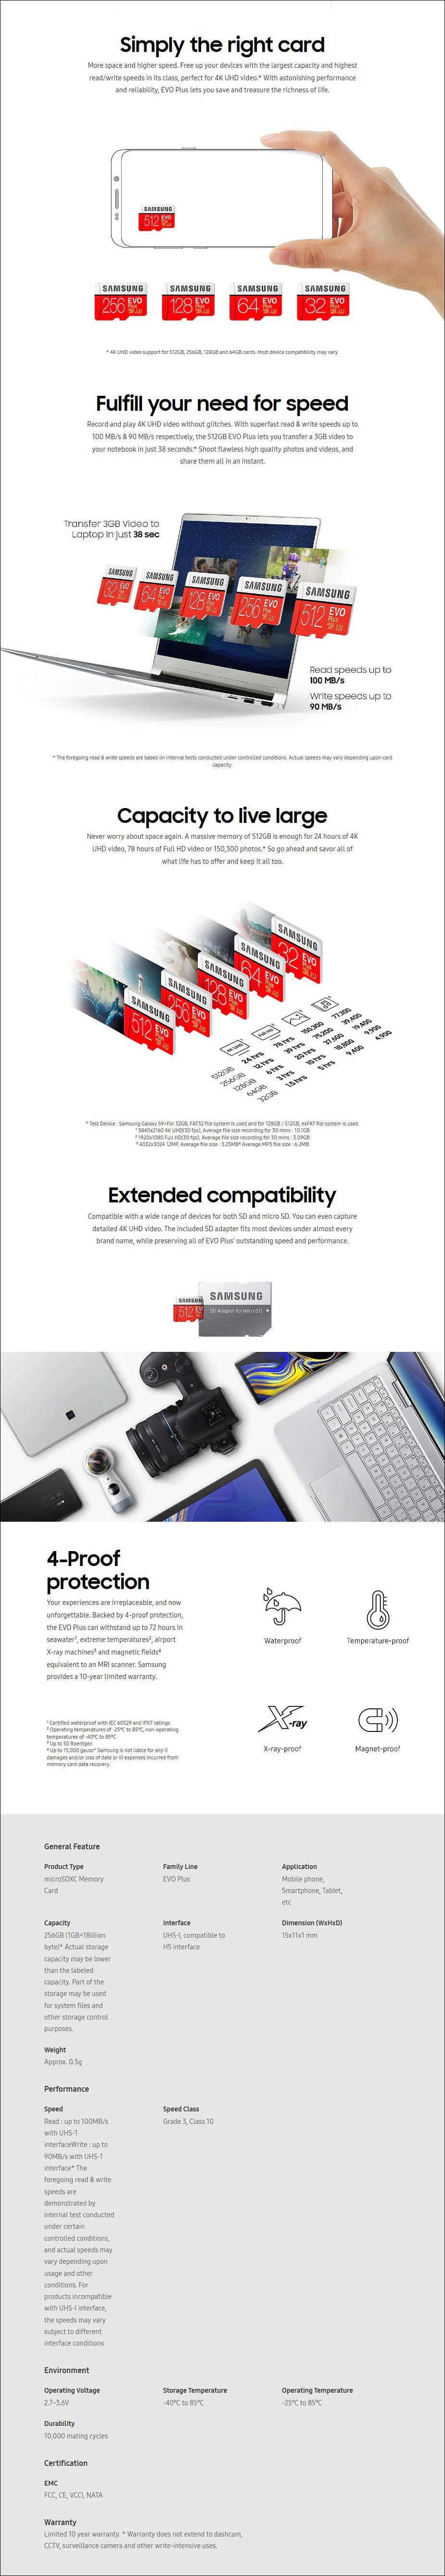 Samsung 256GB microSDXC EVO Plus UHS-I Class 10 Memory Card - No Adapter - Overview 1